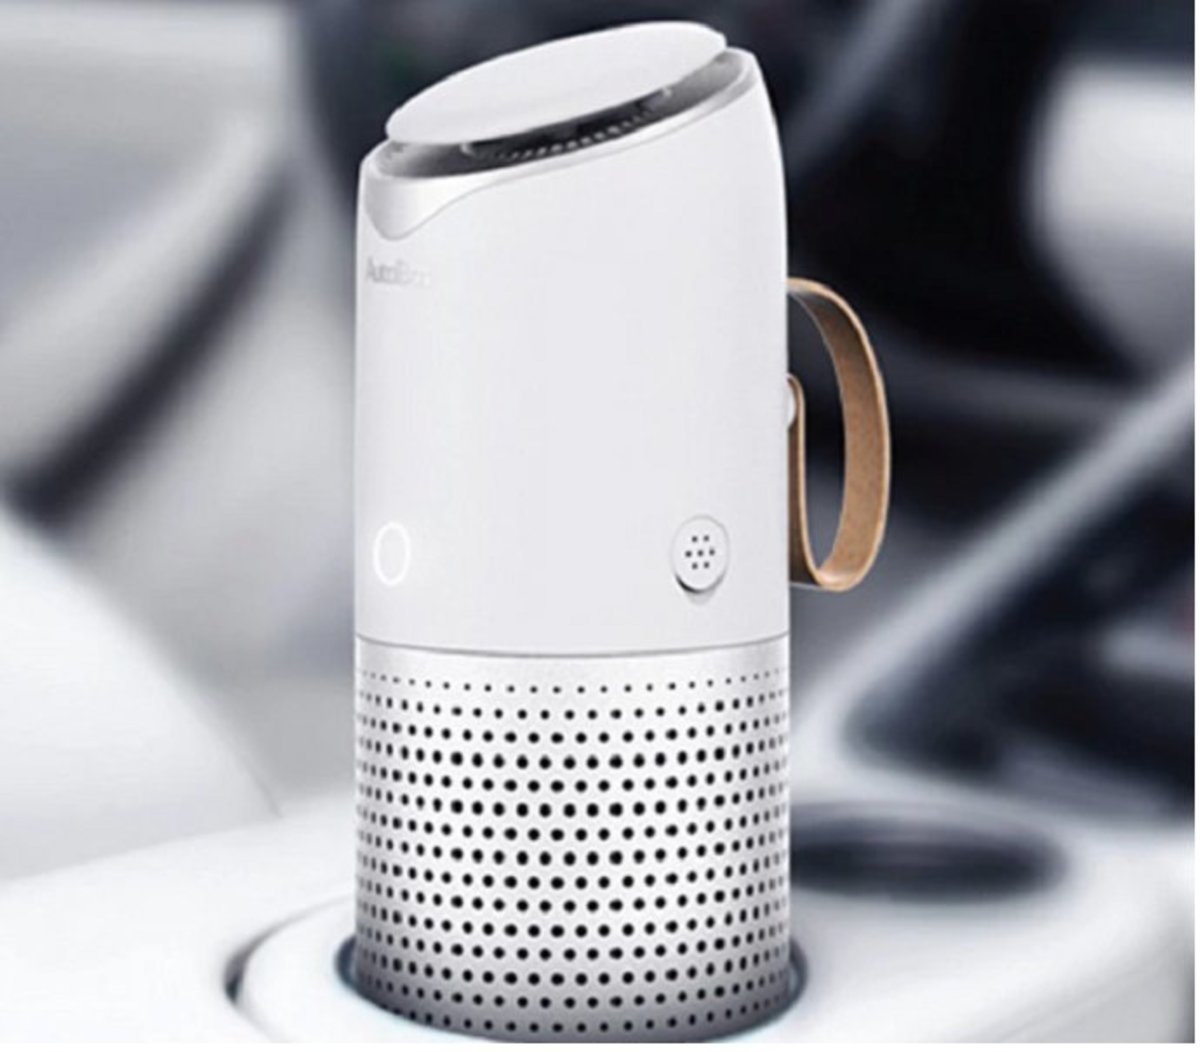 Autobot Fresh - 家用車用 USB 桌面空氣清新機